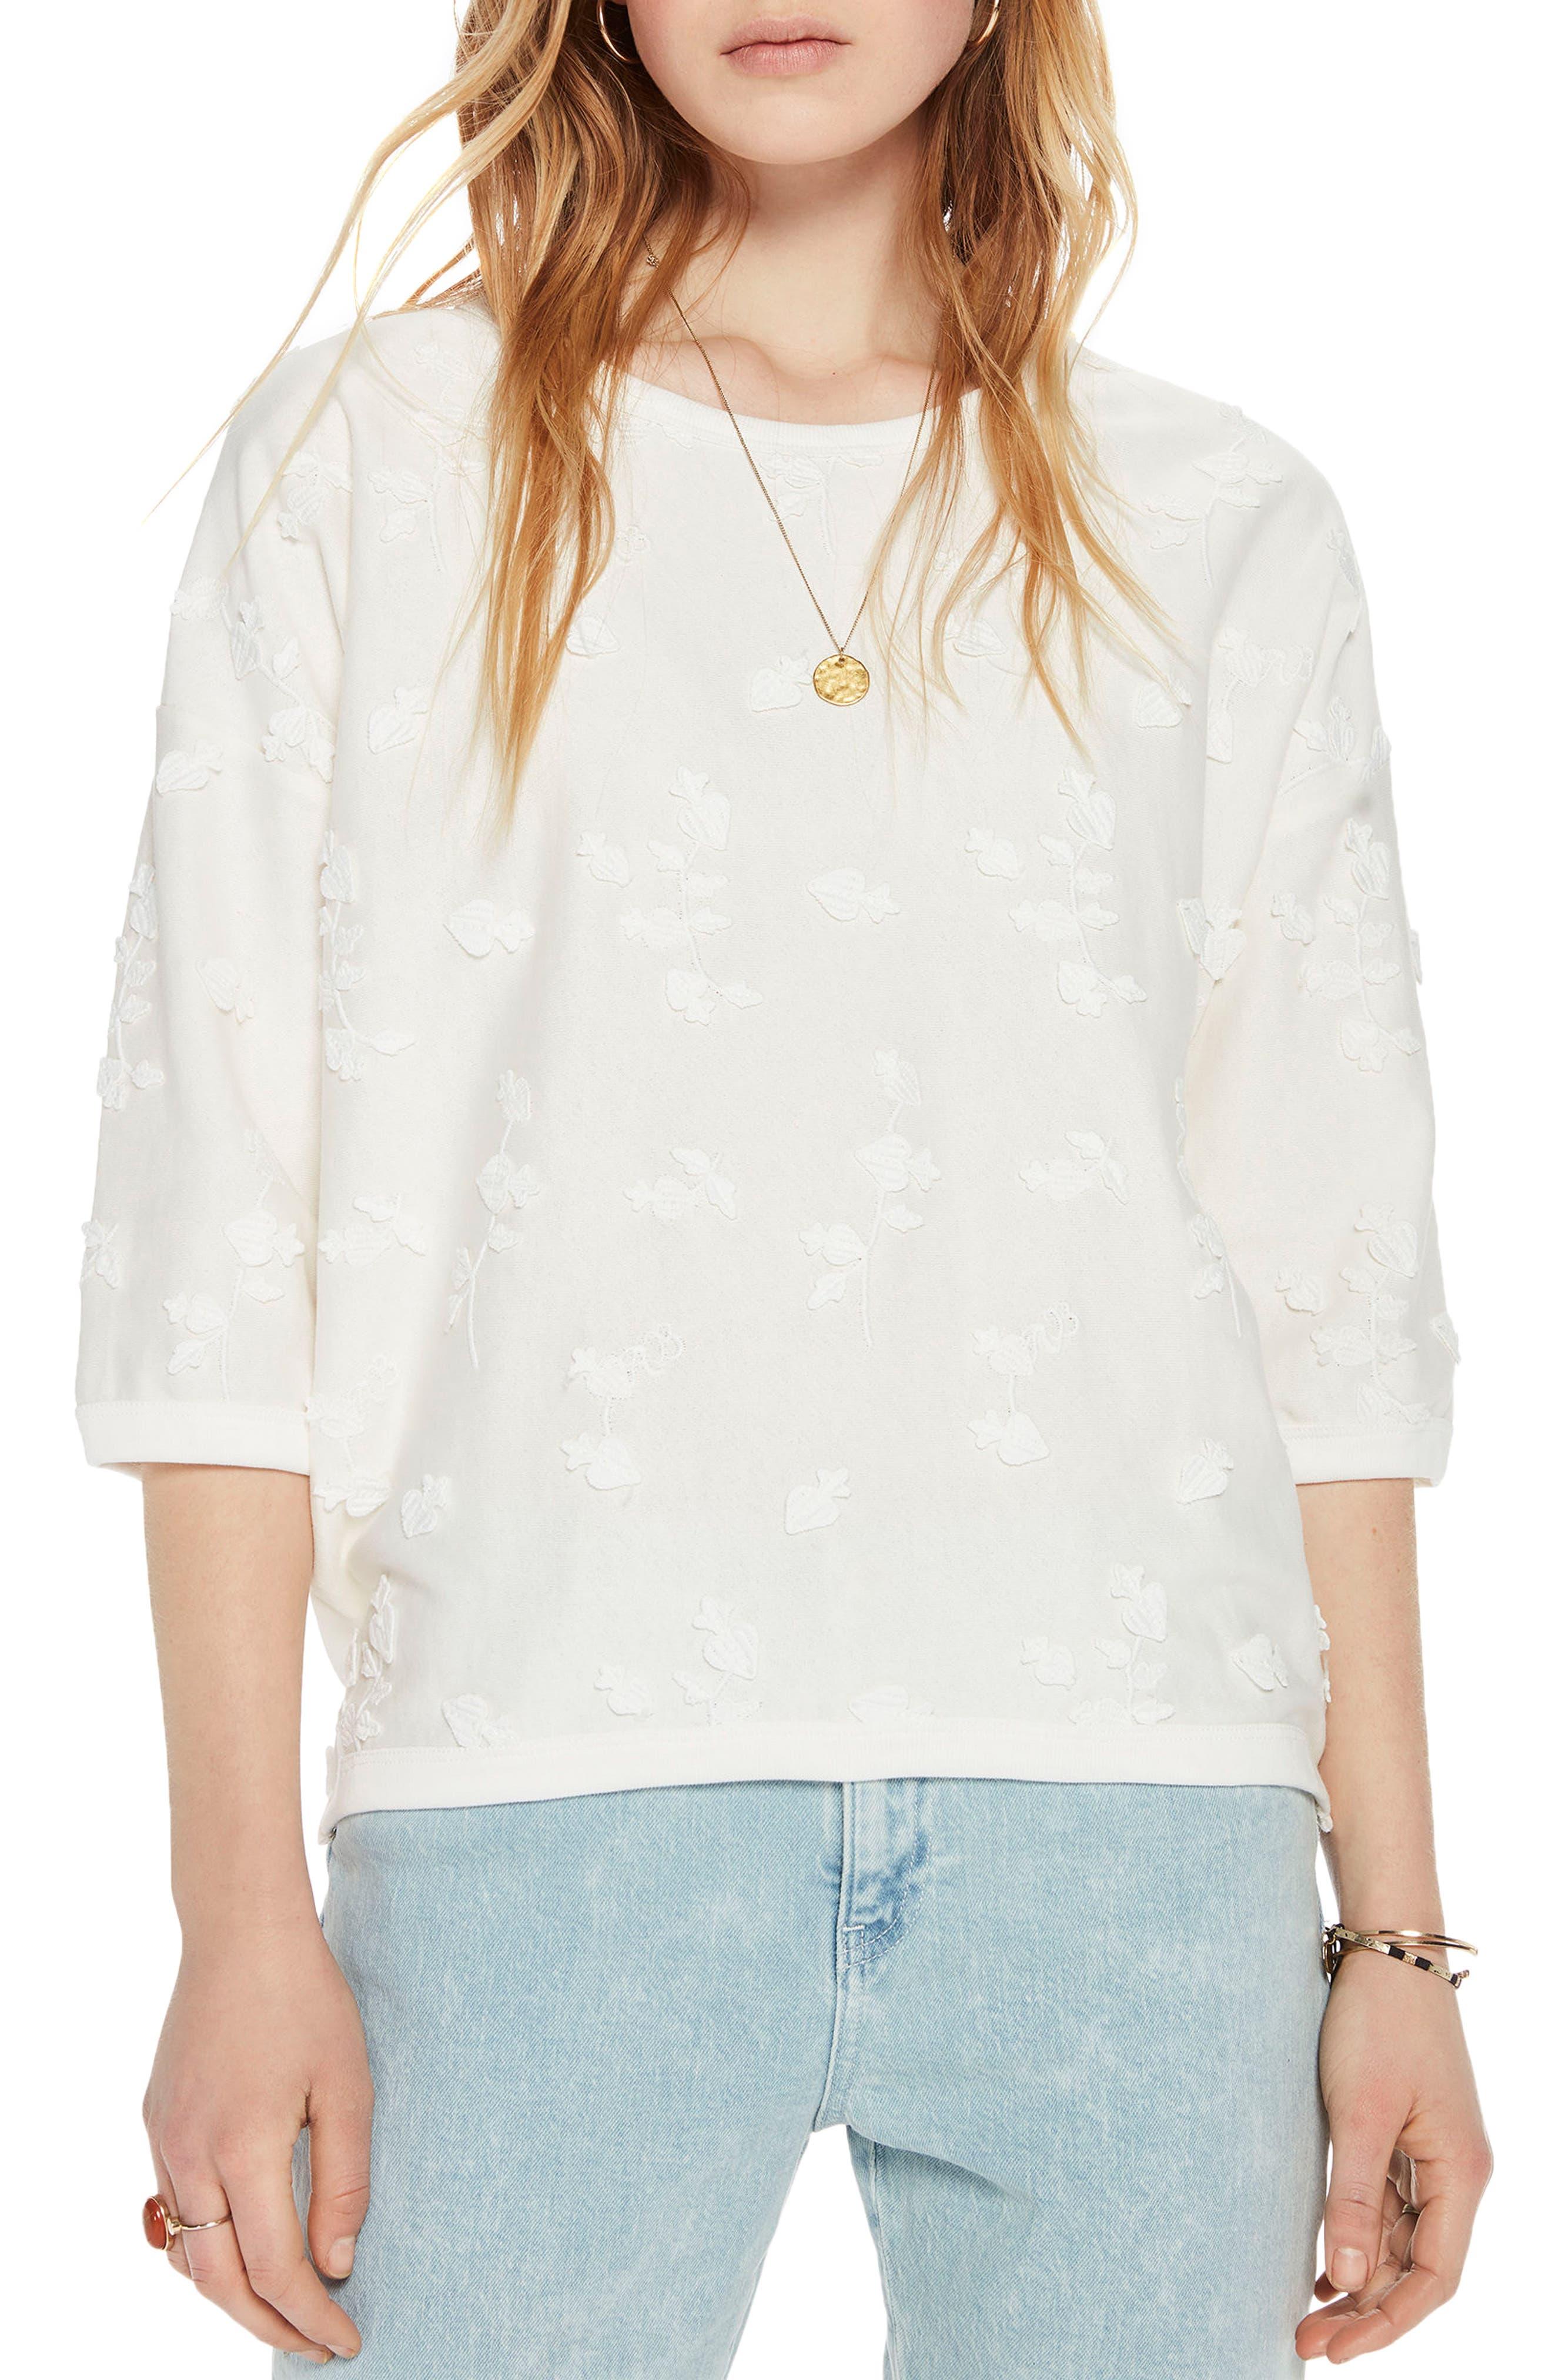 Tonal Embroidered Sweatshirt,                         Main,                         color, 01 Denim White